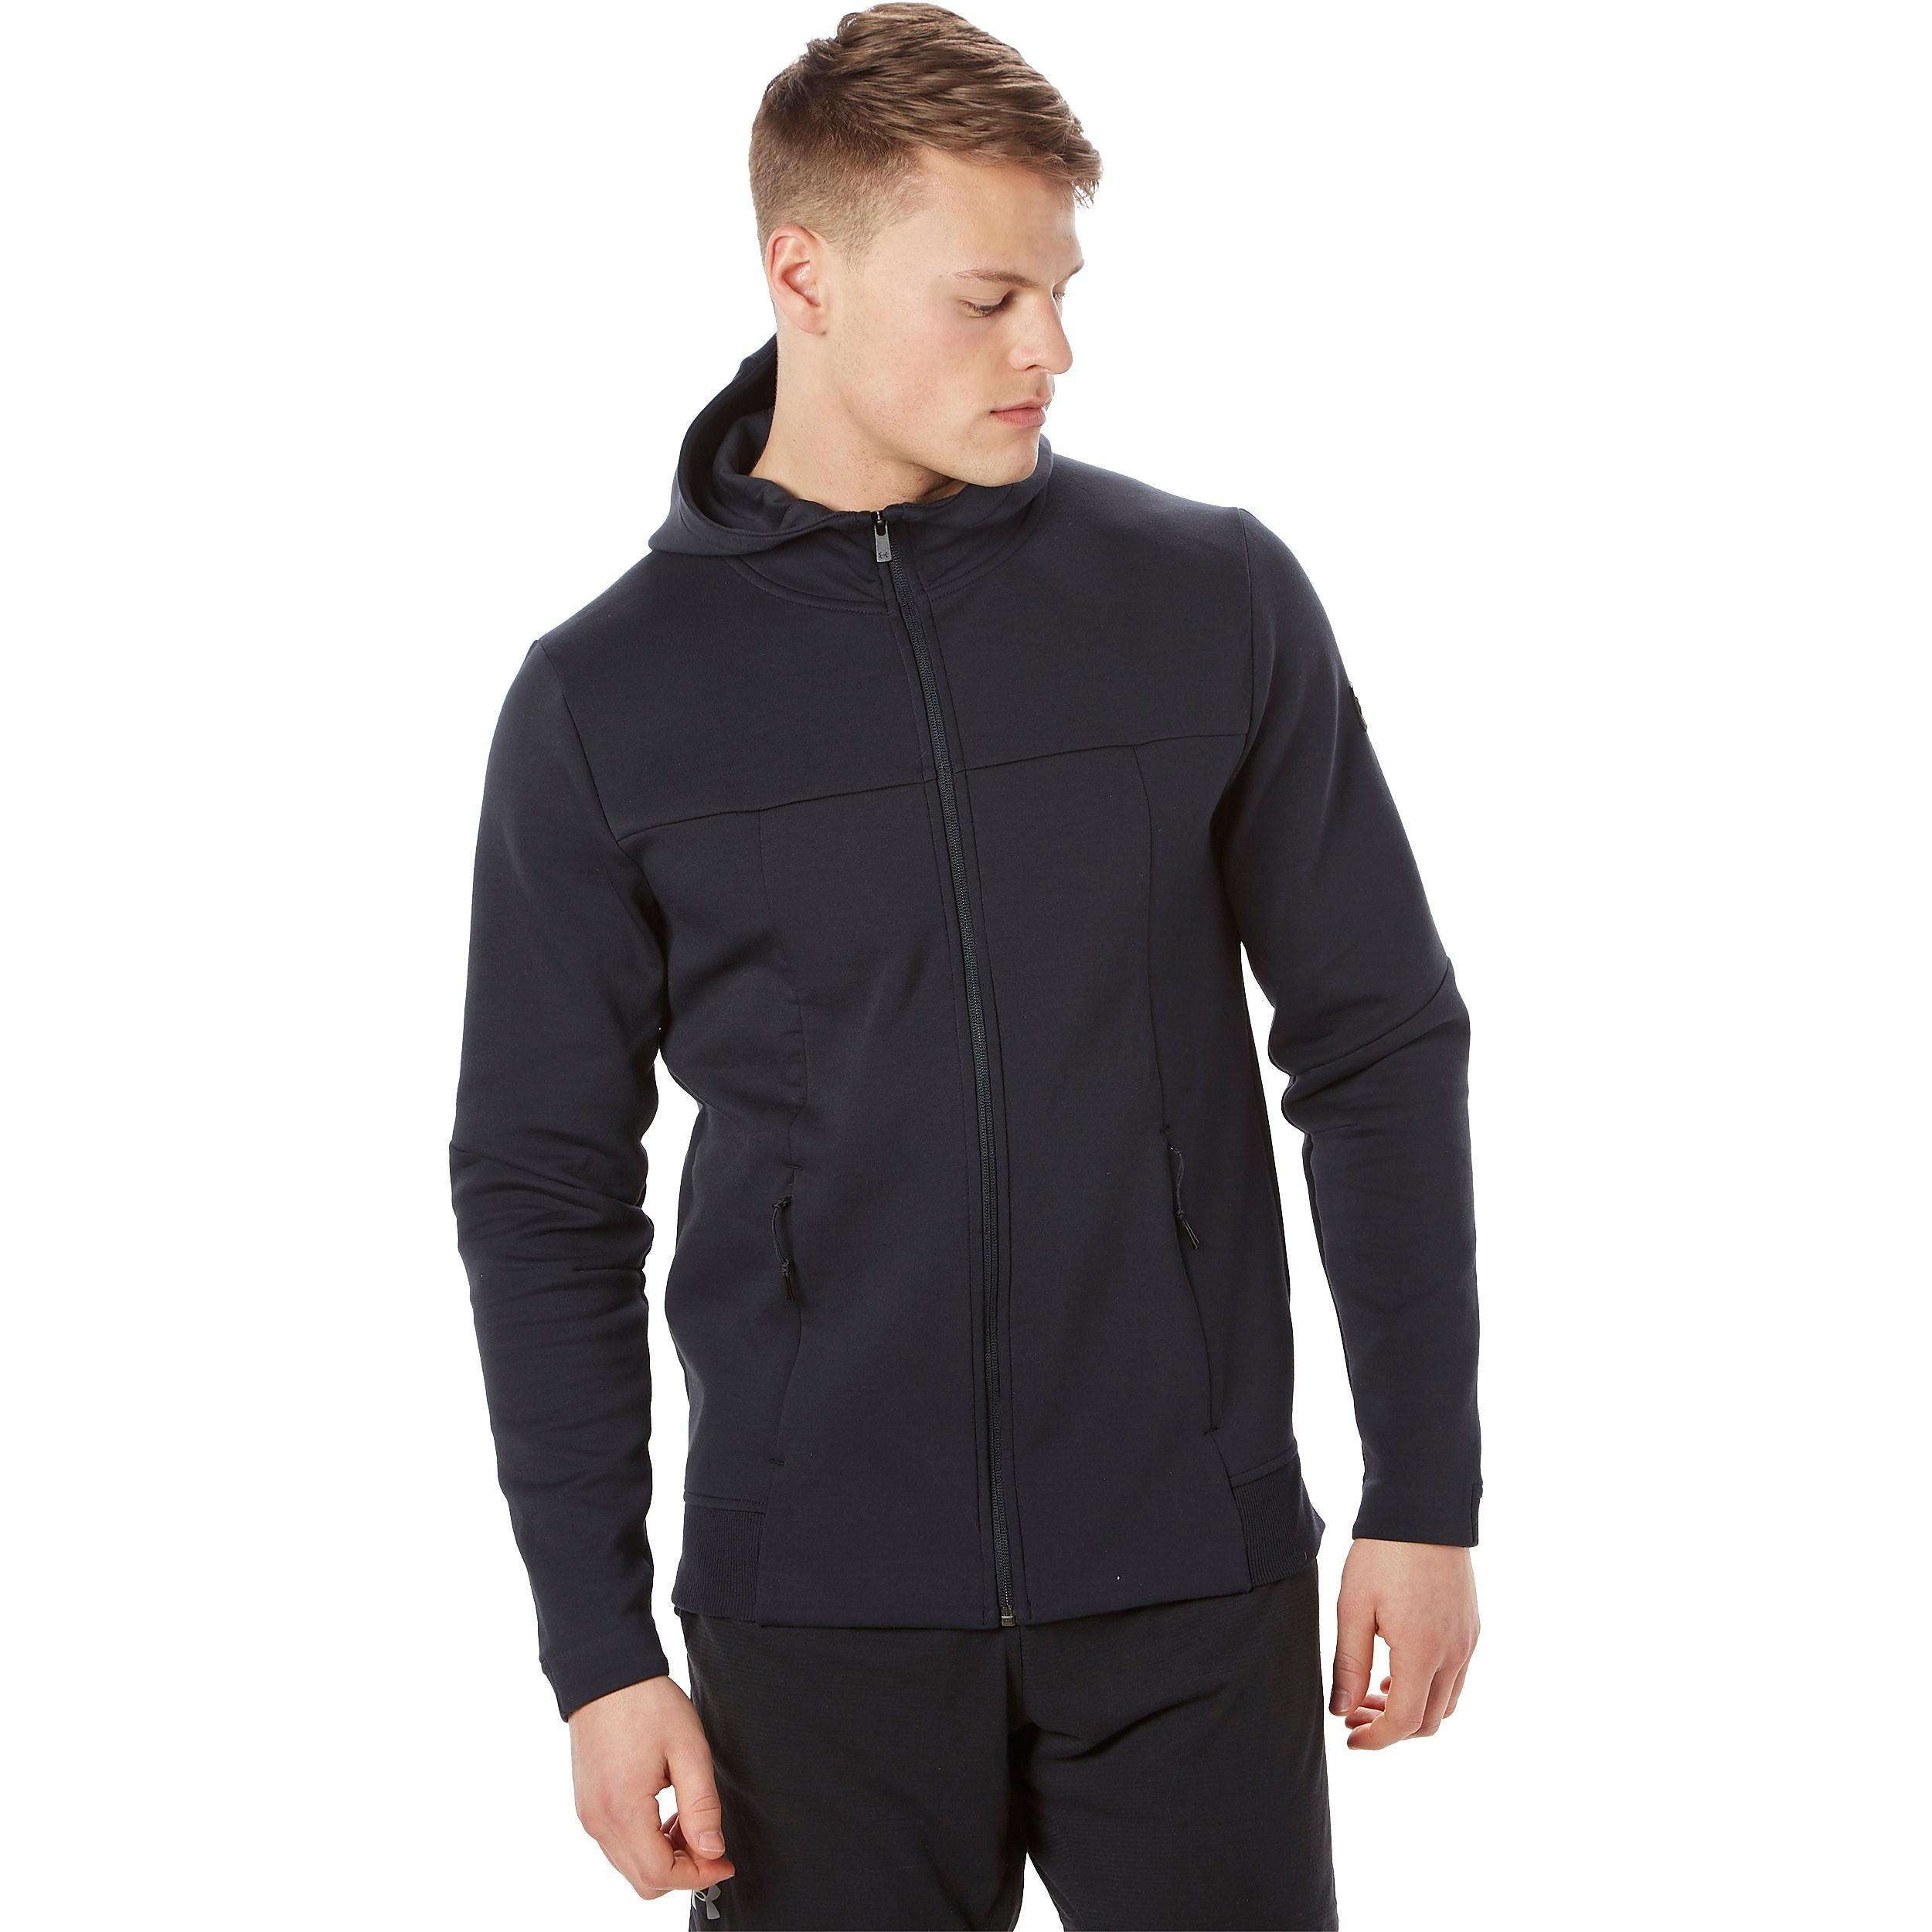 Men's Under Armour Sportstyle Elite Utility Full Zip Training Jacket - Black, Black